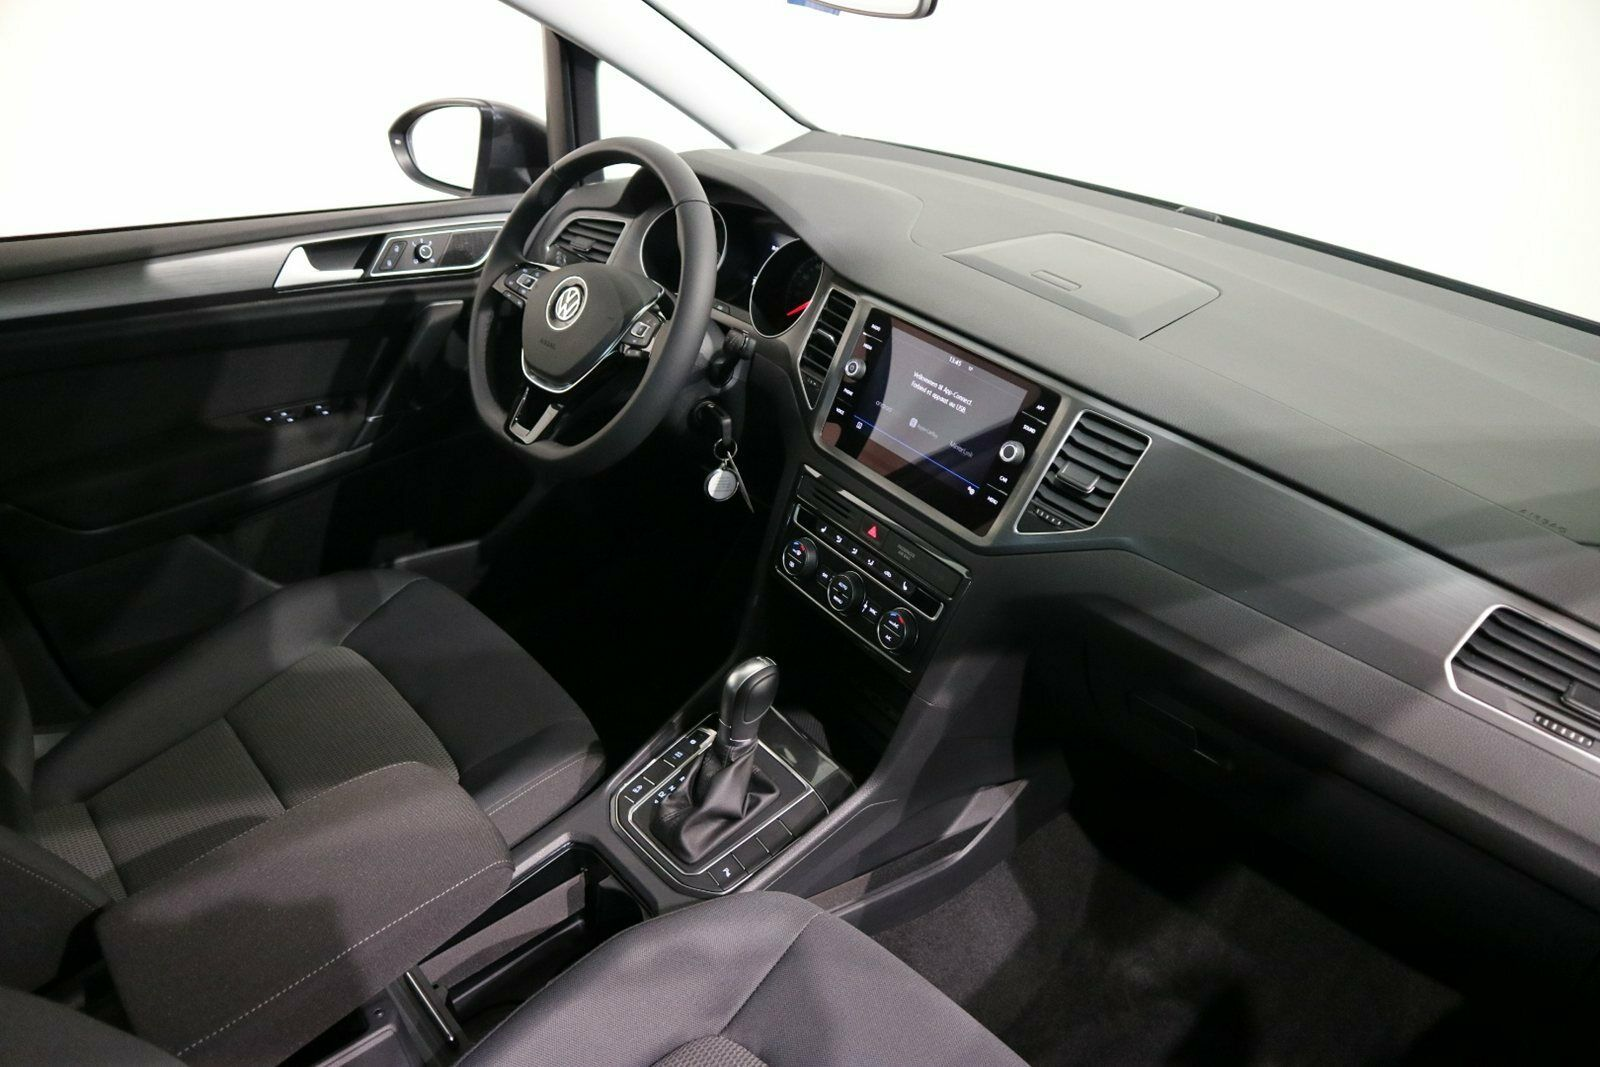 VW Golf Sportsvan 1,6 TDi 115 Comfortline DSG - billede 6